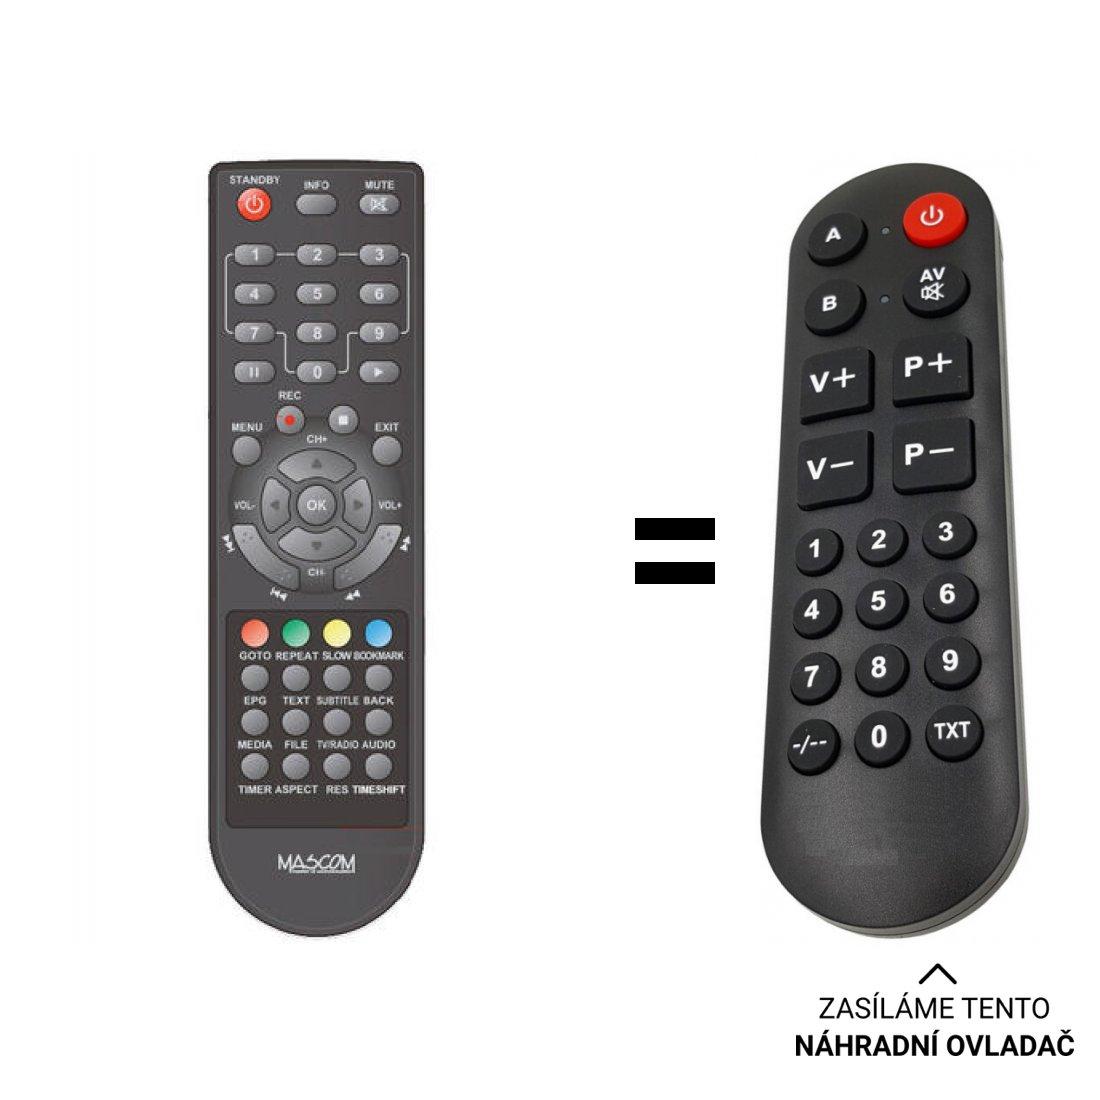 Mascom MC2202HDCI replacement remote control for seniors